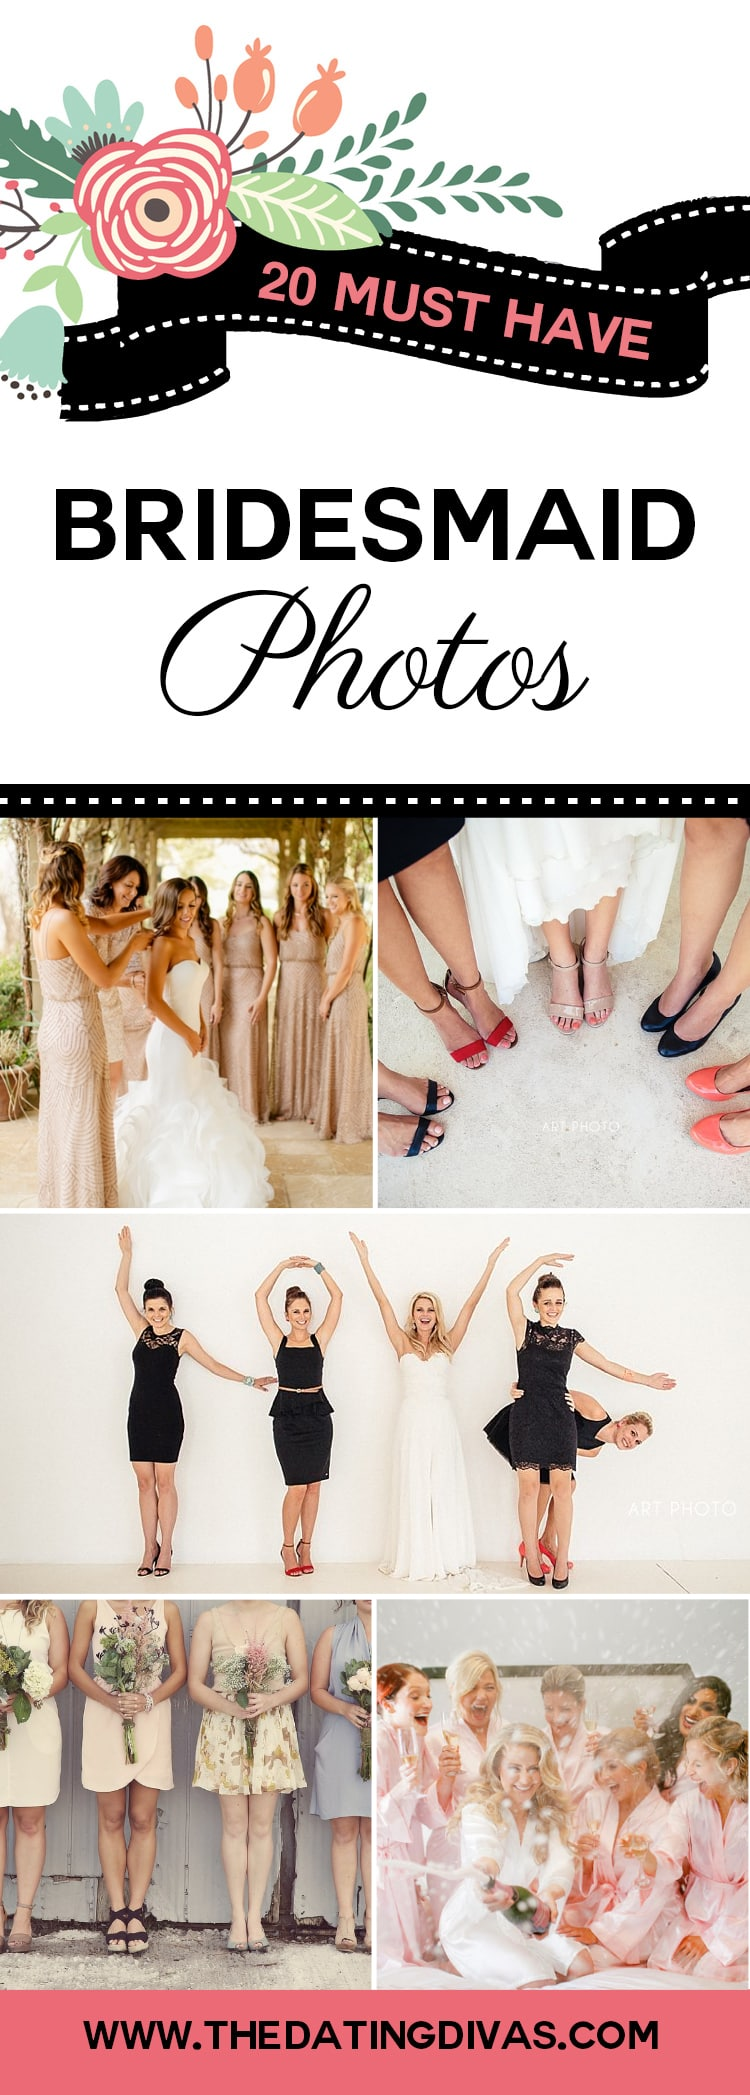 Must-Have Bridesmaid Photos